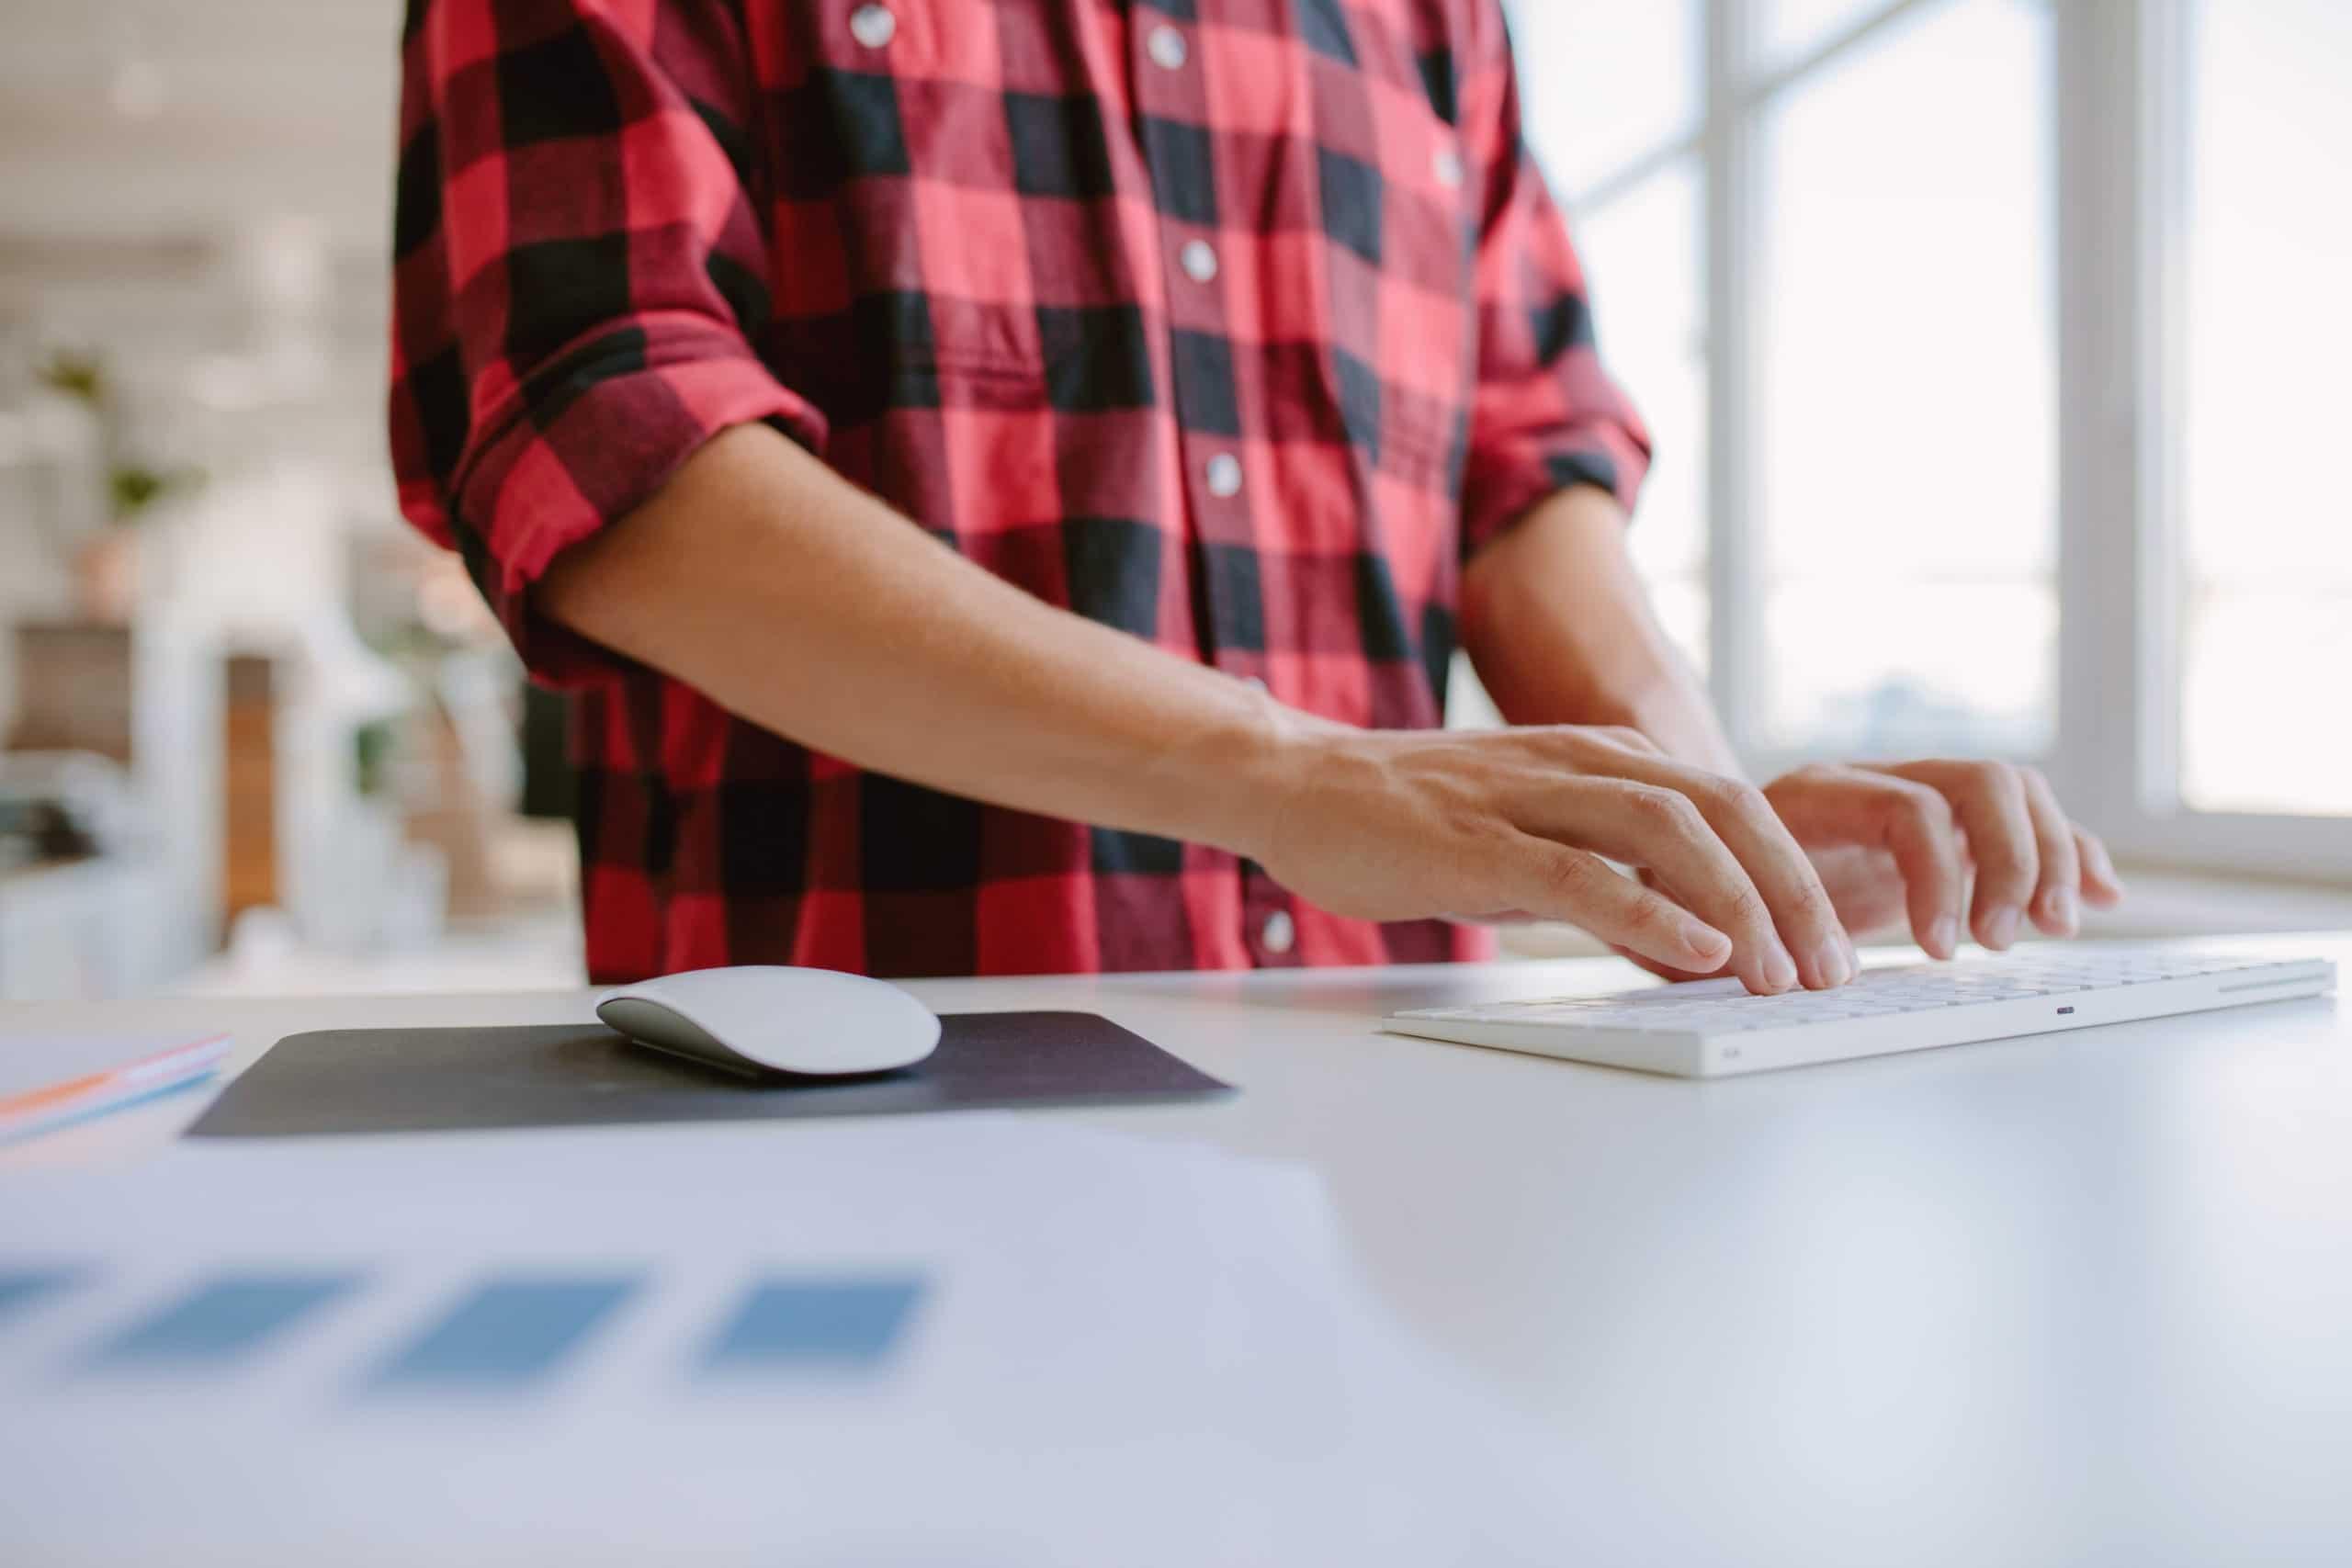 Händer skriver på tangentbord i kontorsmiljö